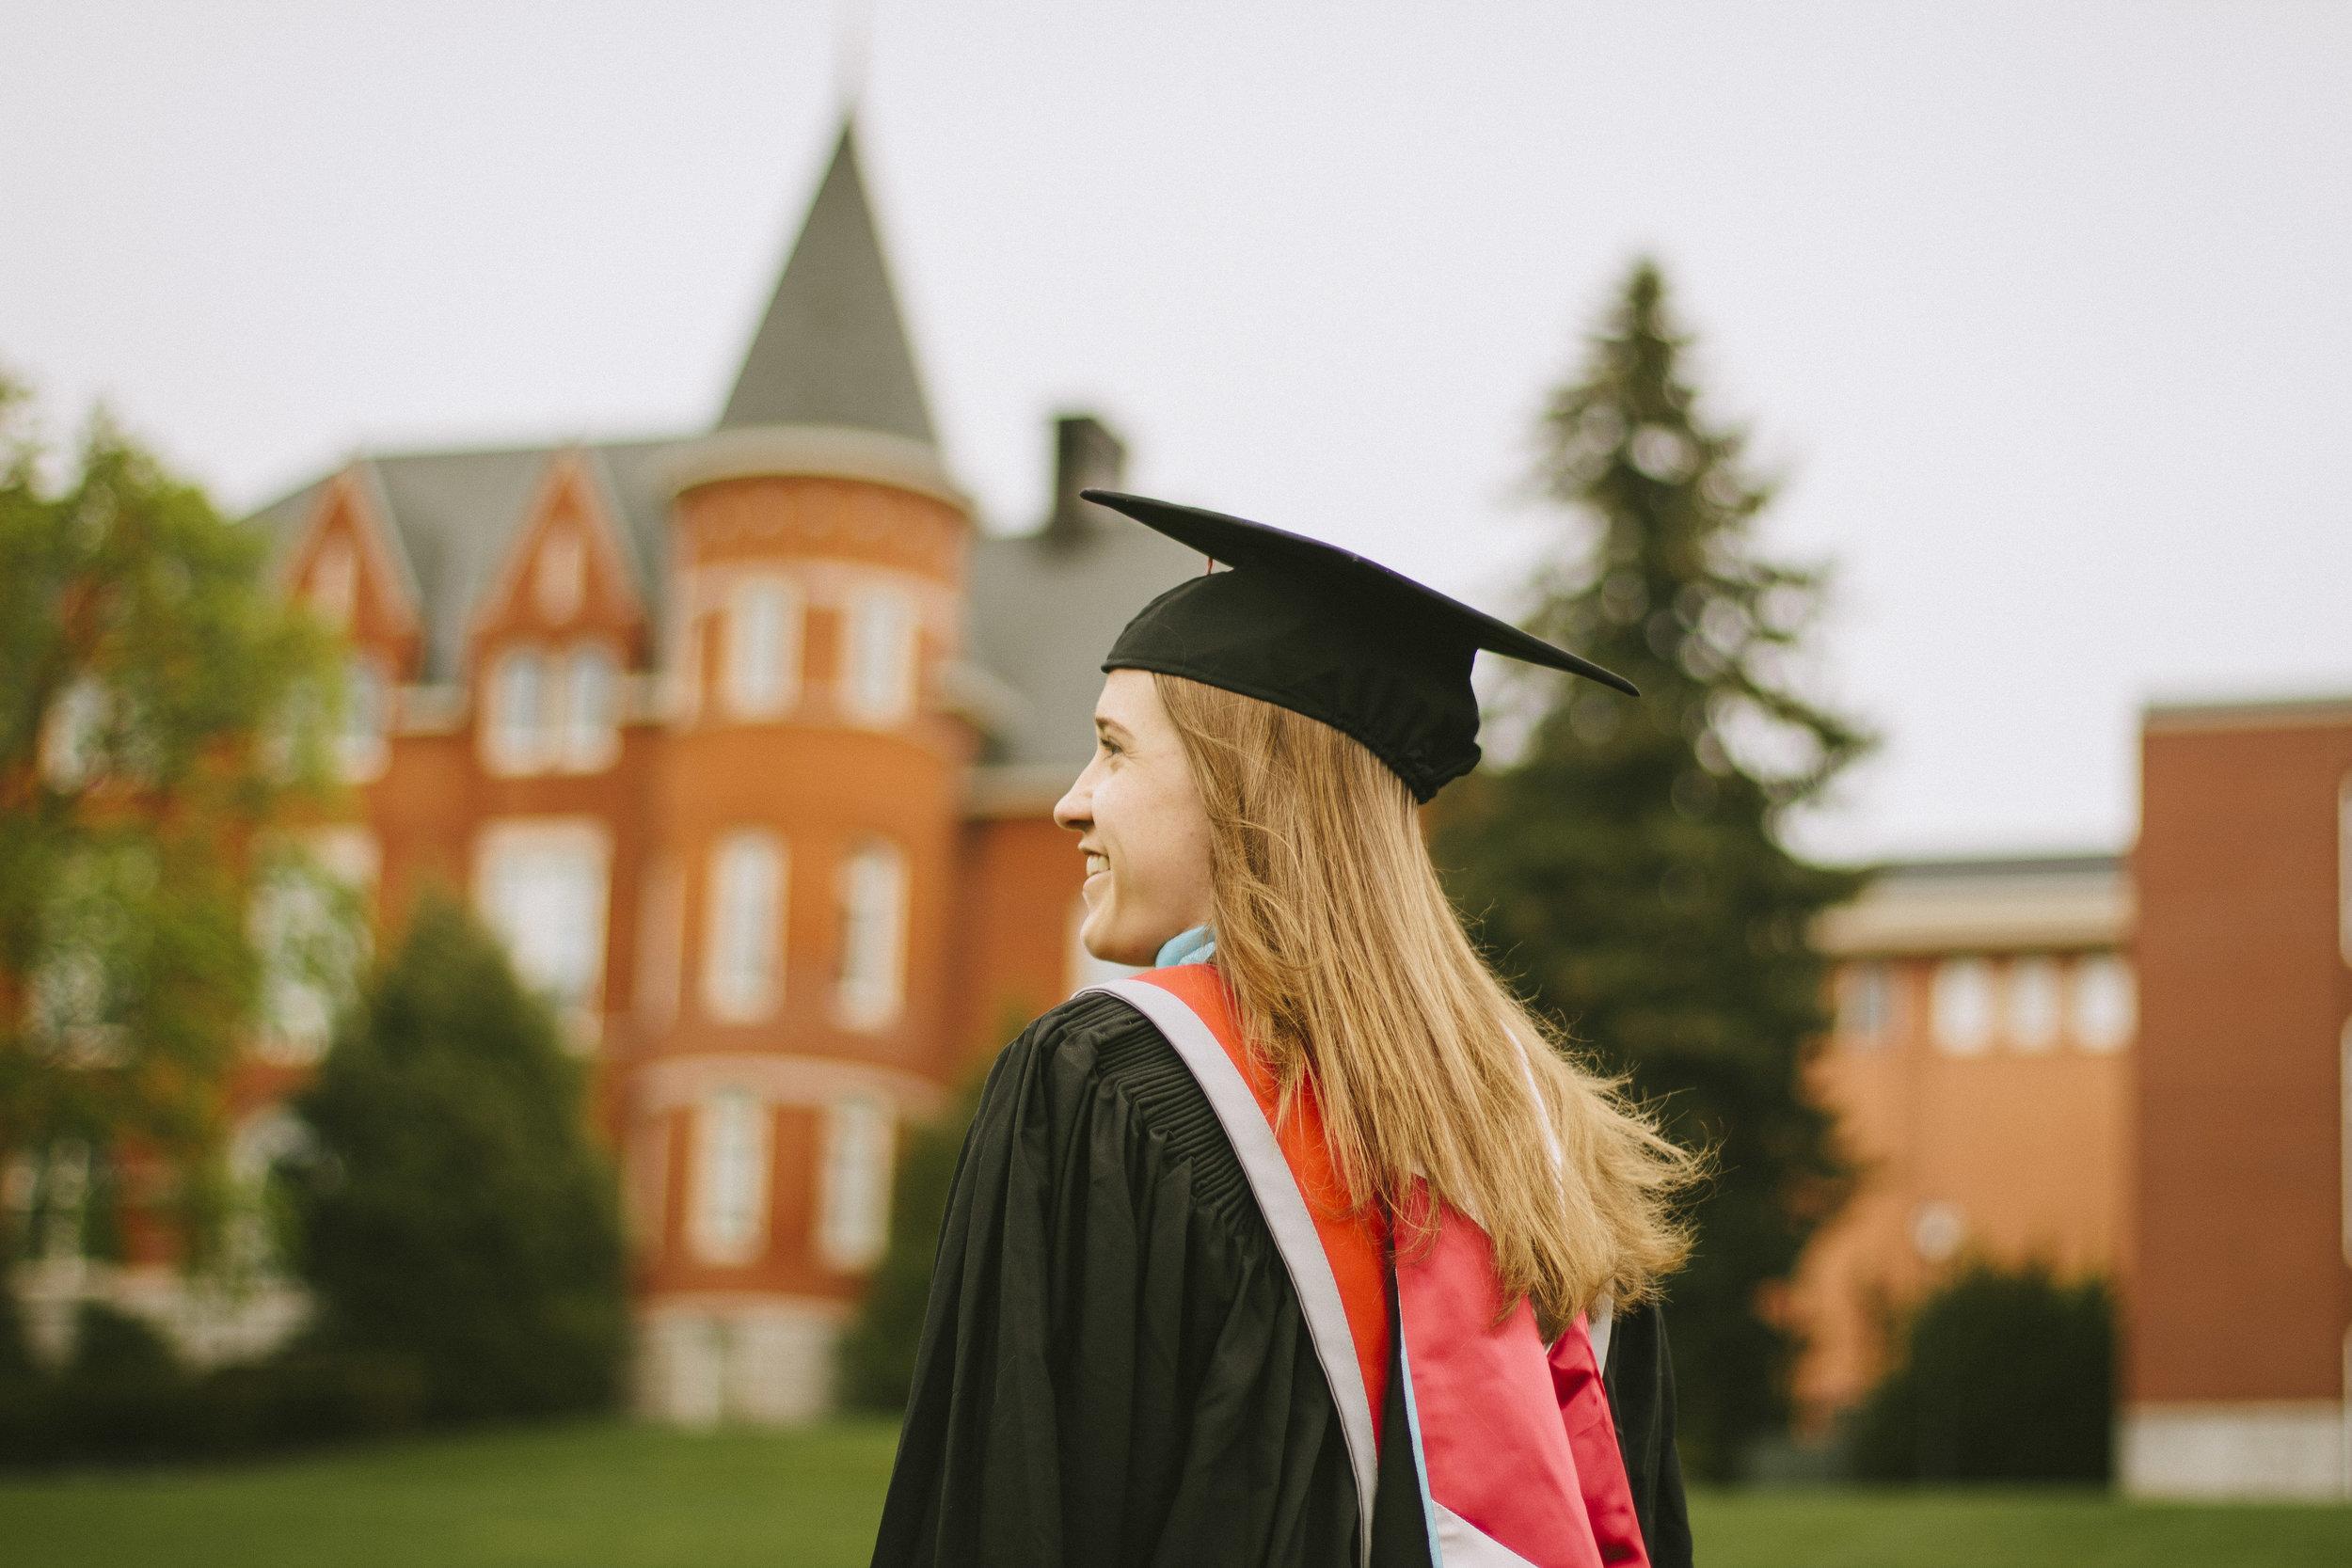 Kelly_Graduation-1.jpg